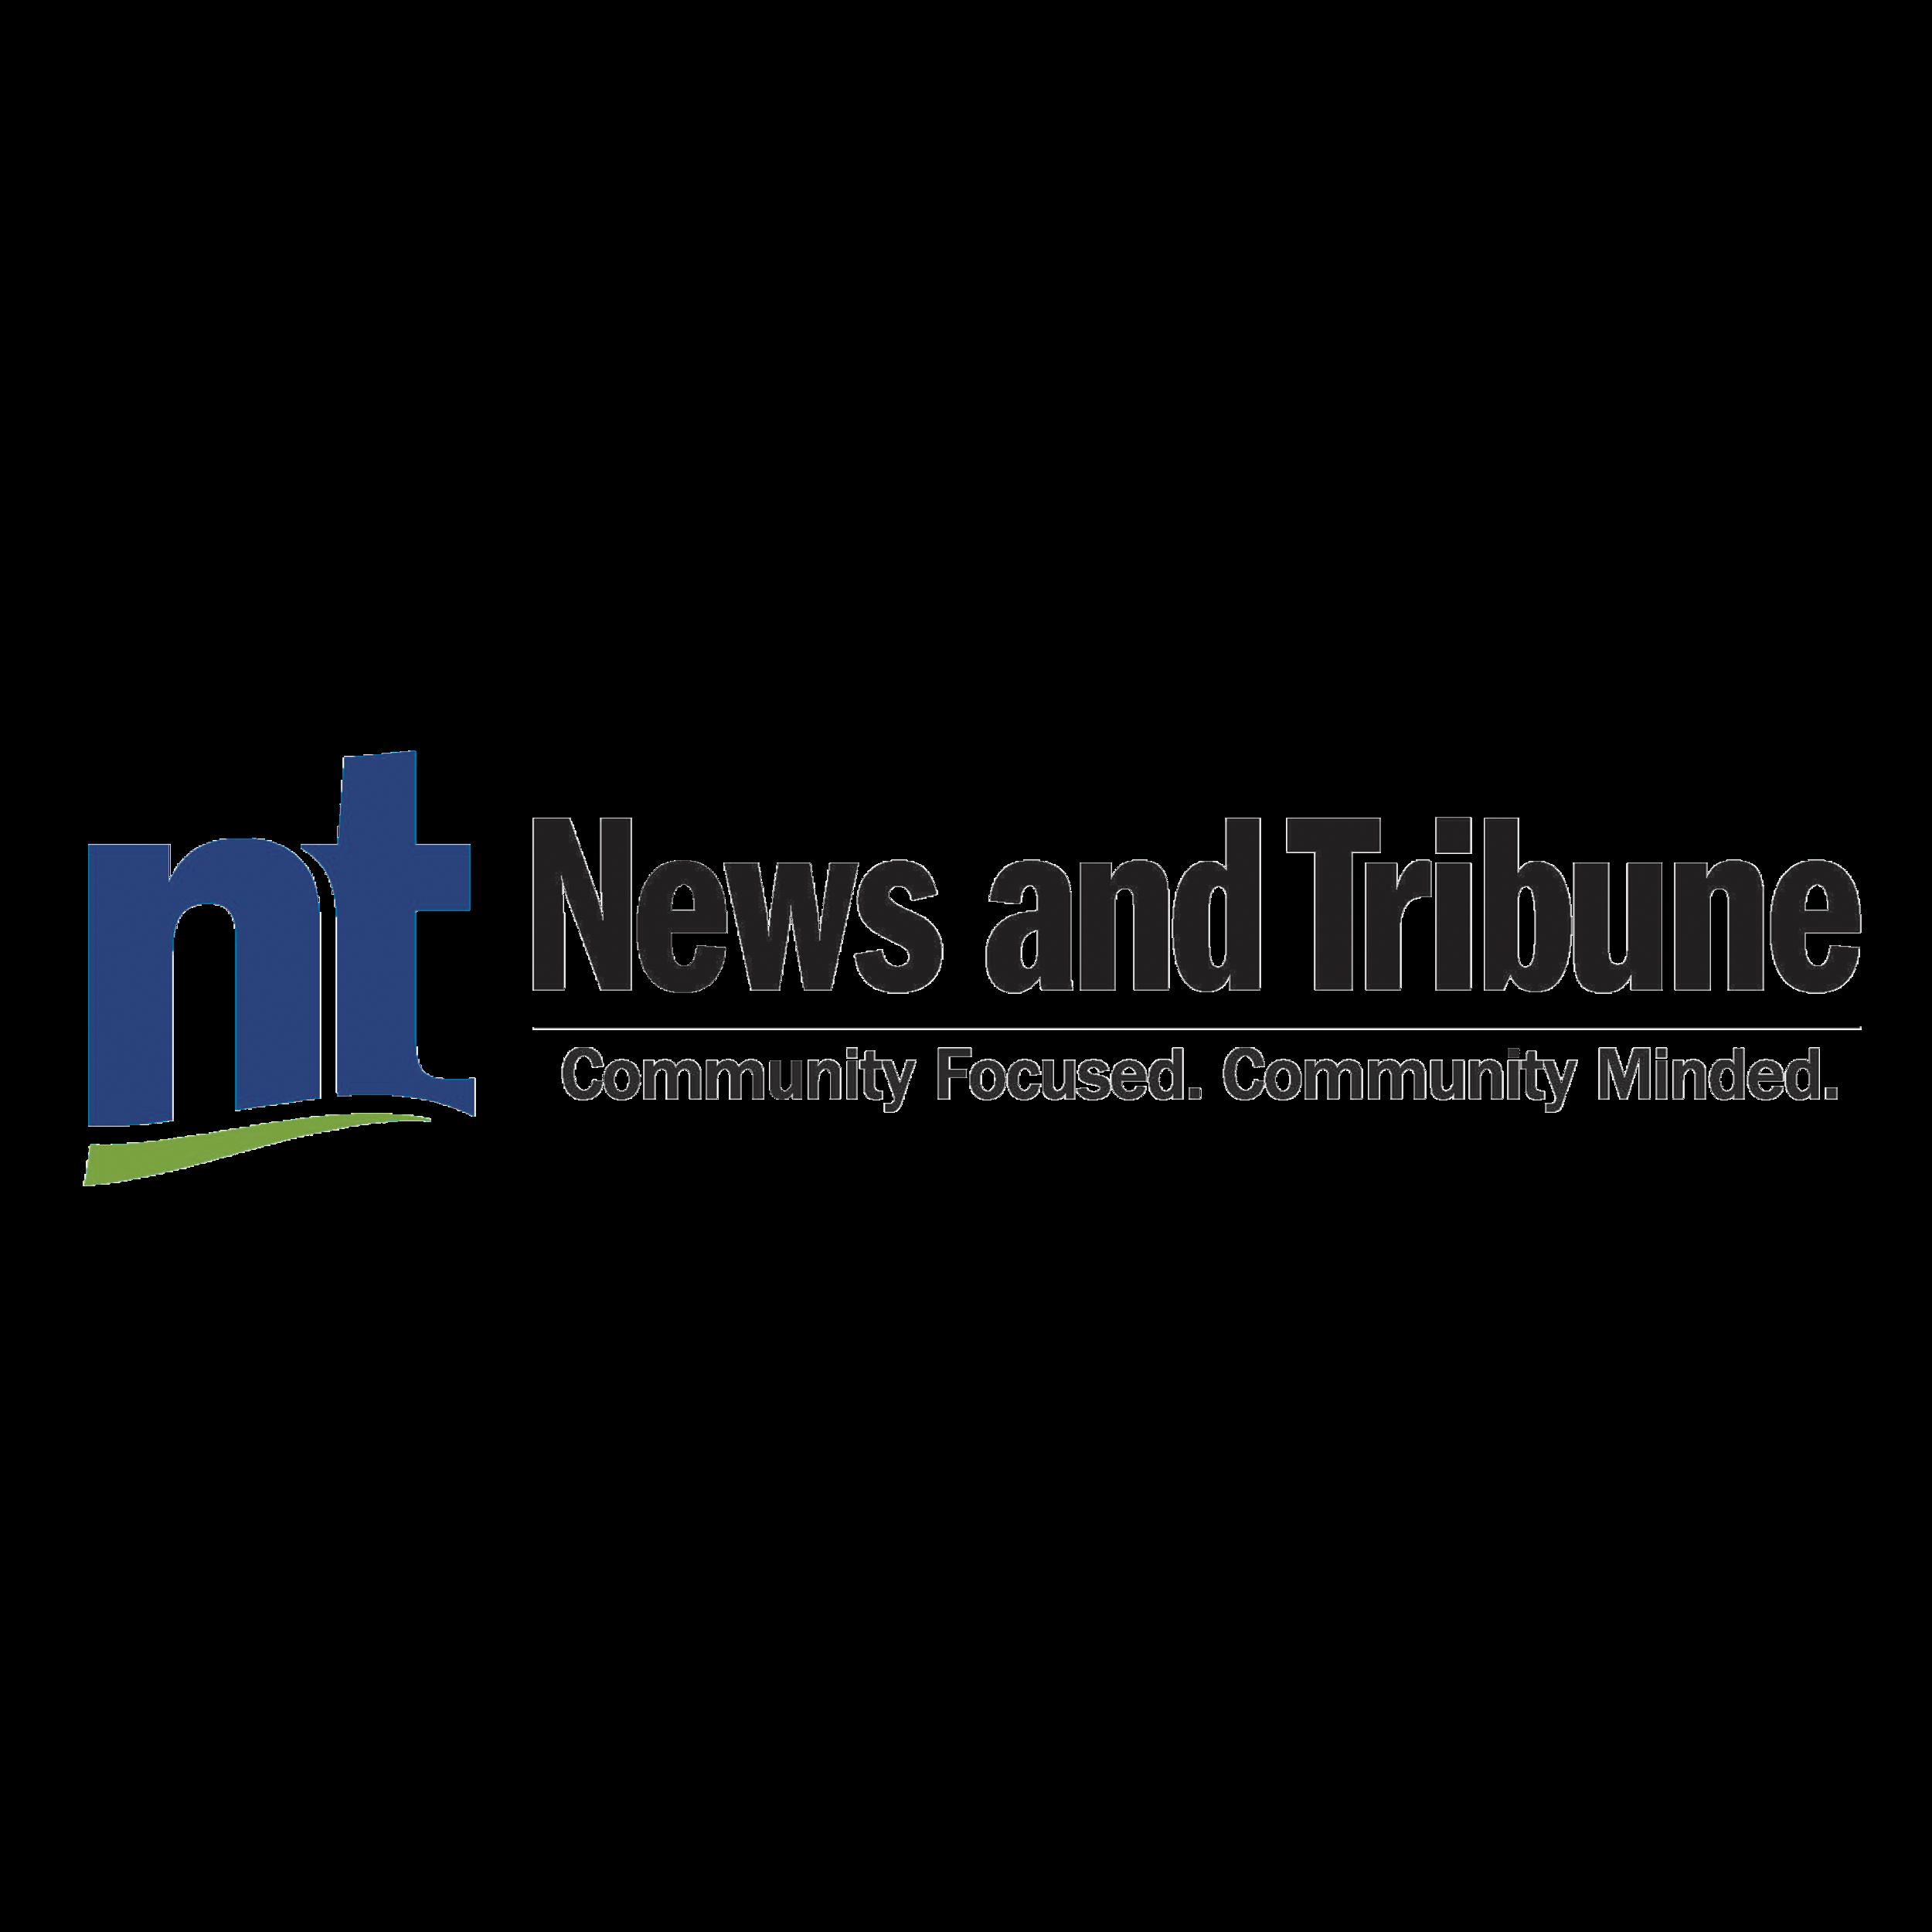 news and tribune logo.png